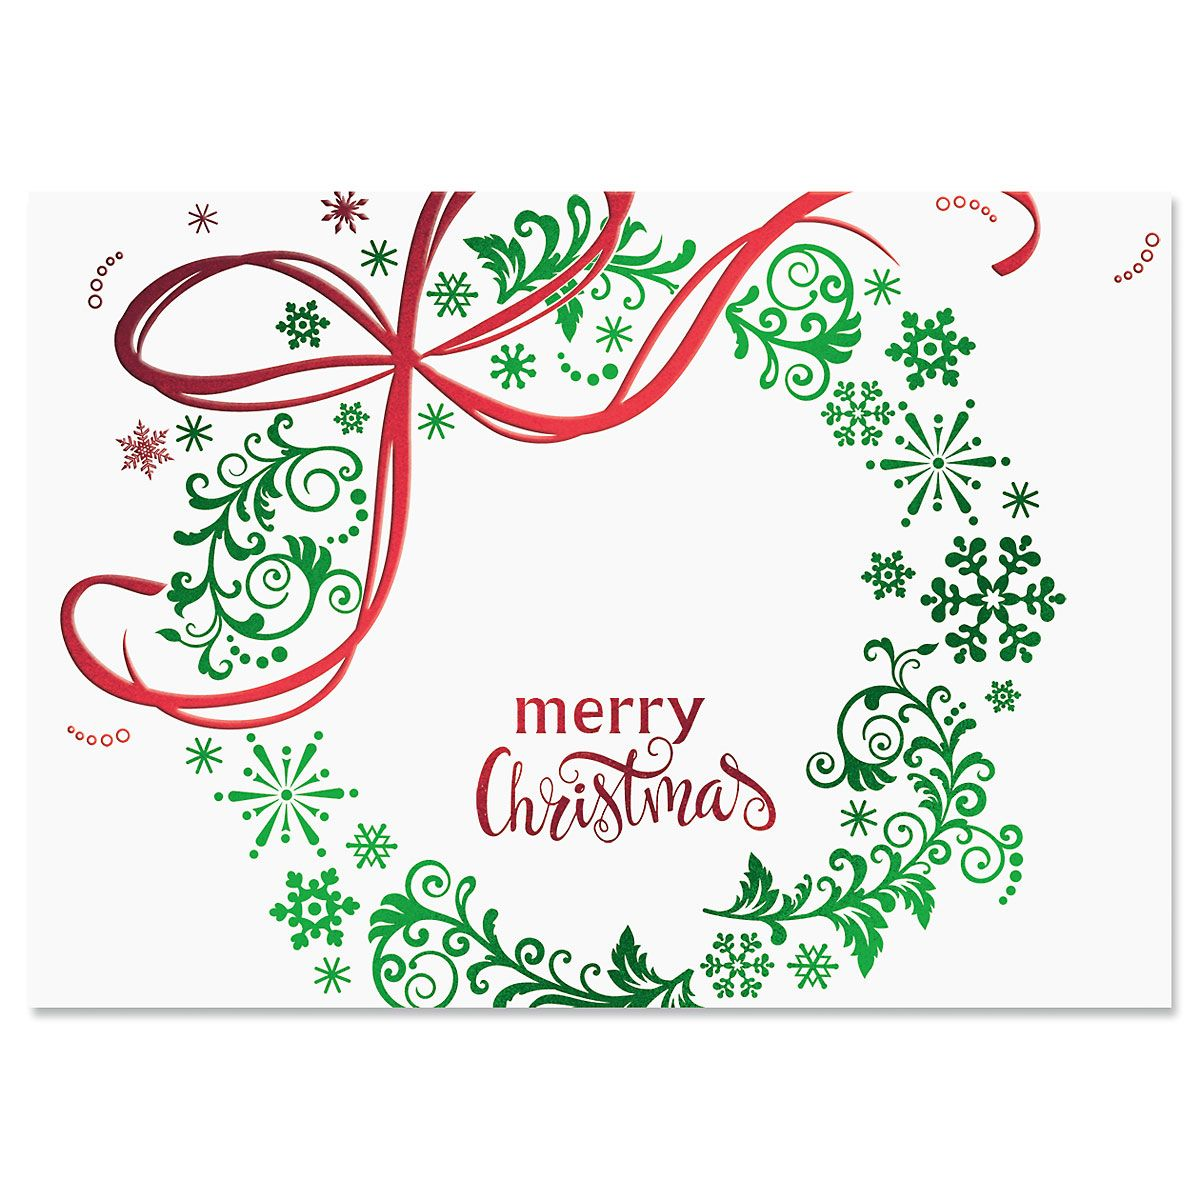 Christmas Wreath Deluxe Foil Christmas Cards